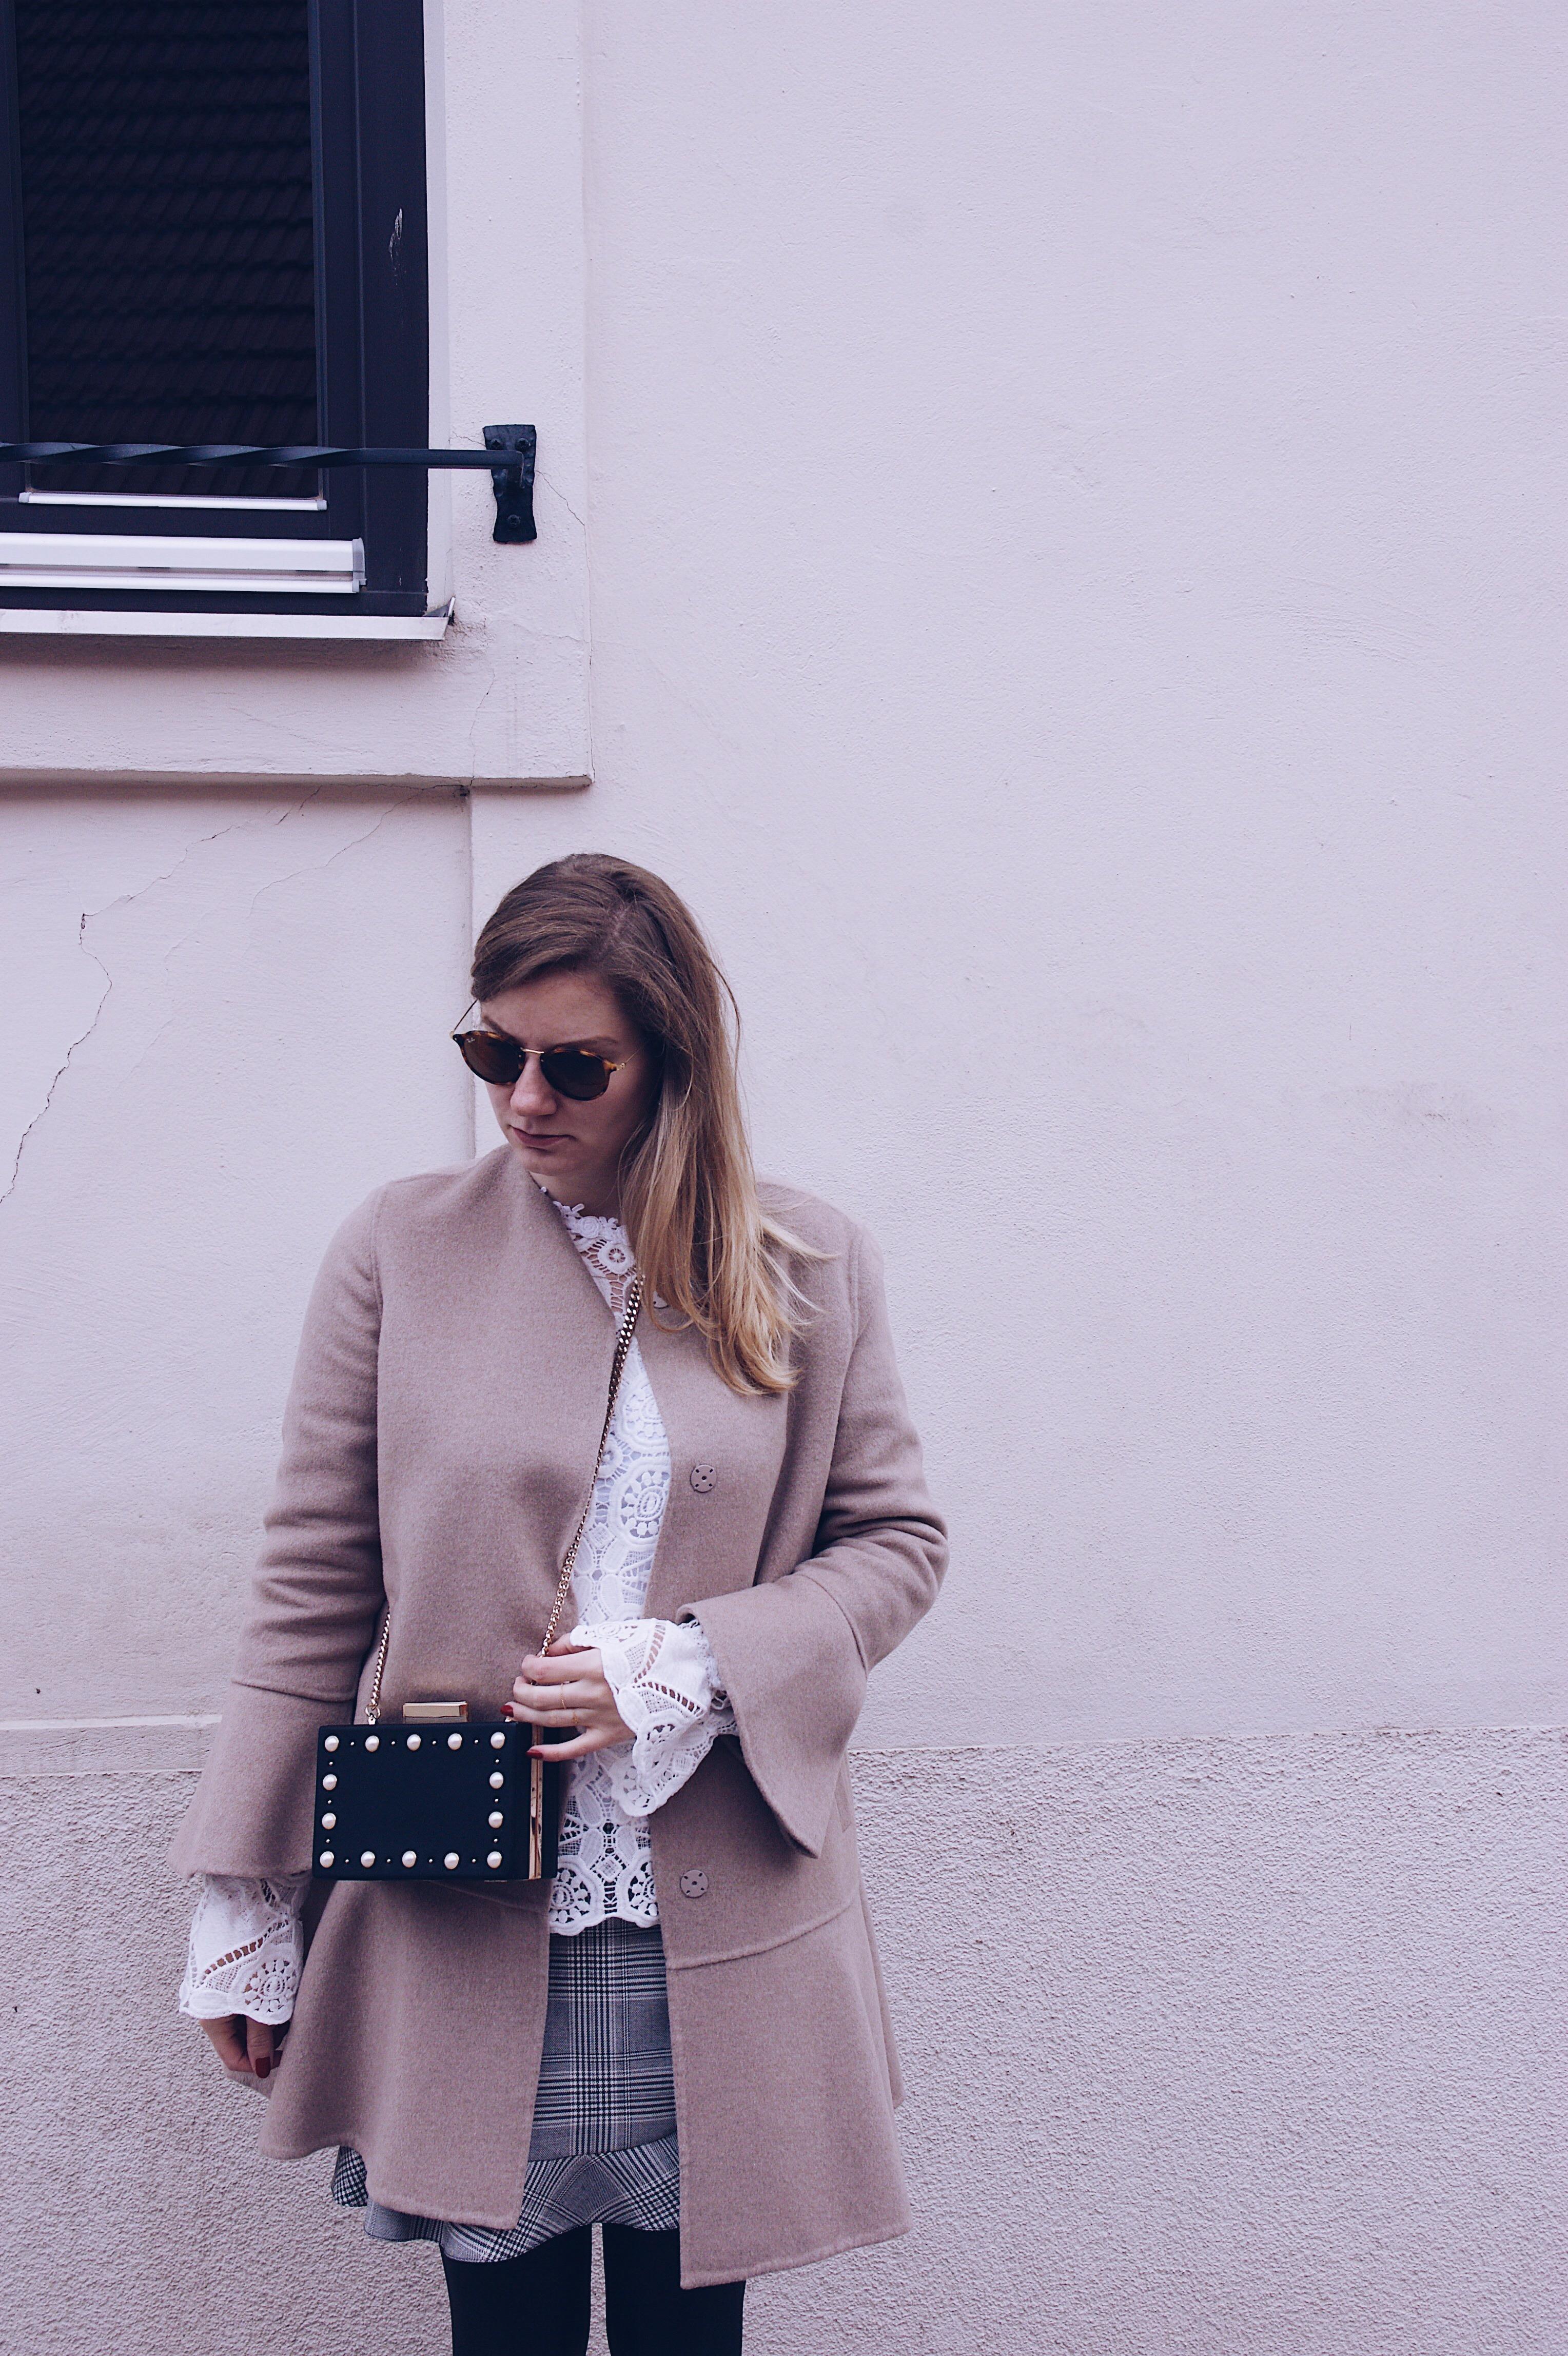 Zara Mantel, Volant Rock, Spitzenbluse, Perlentasche